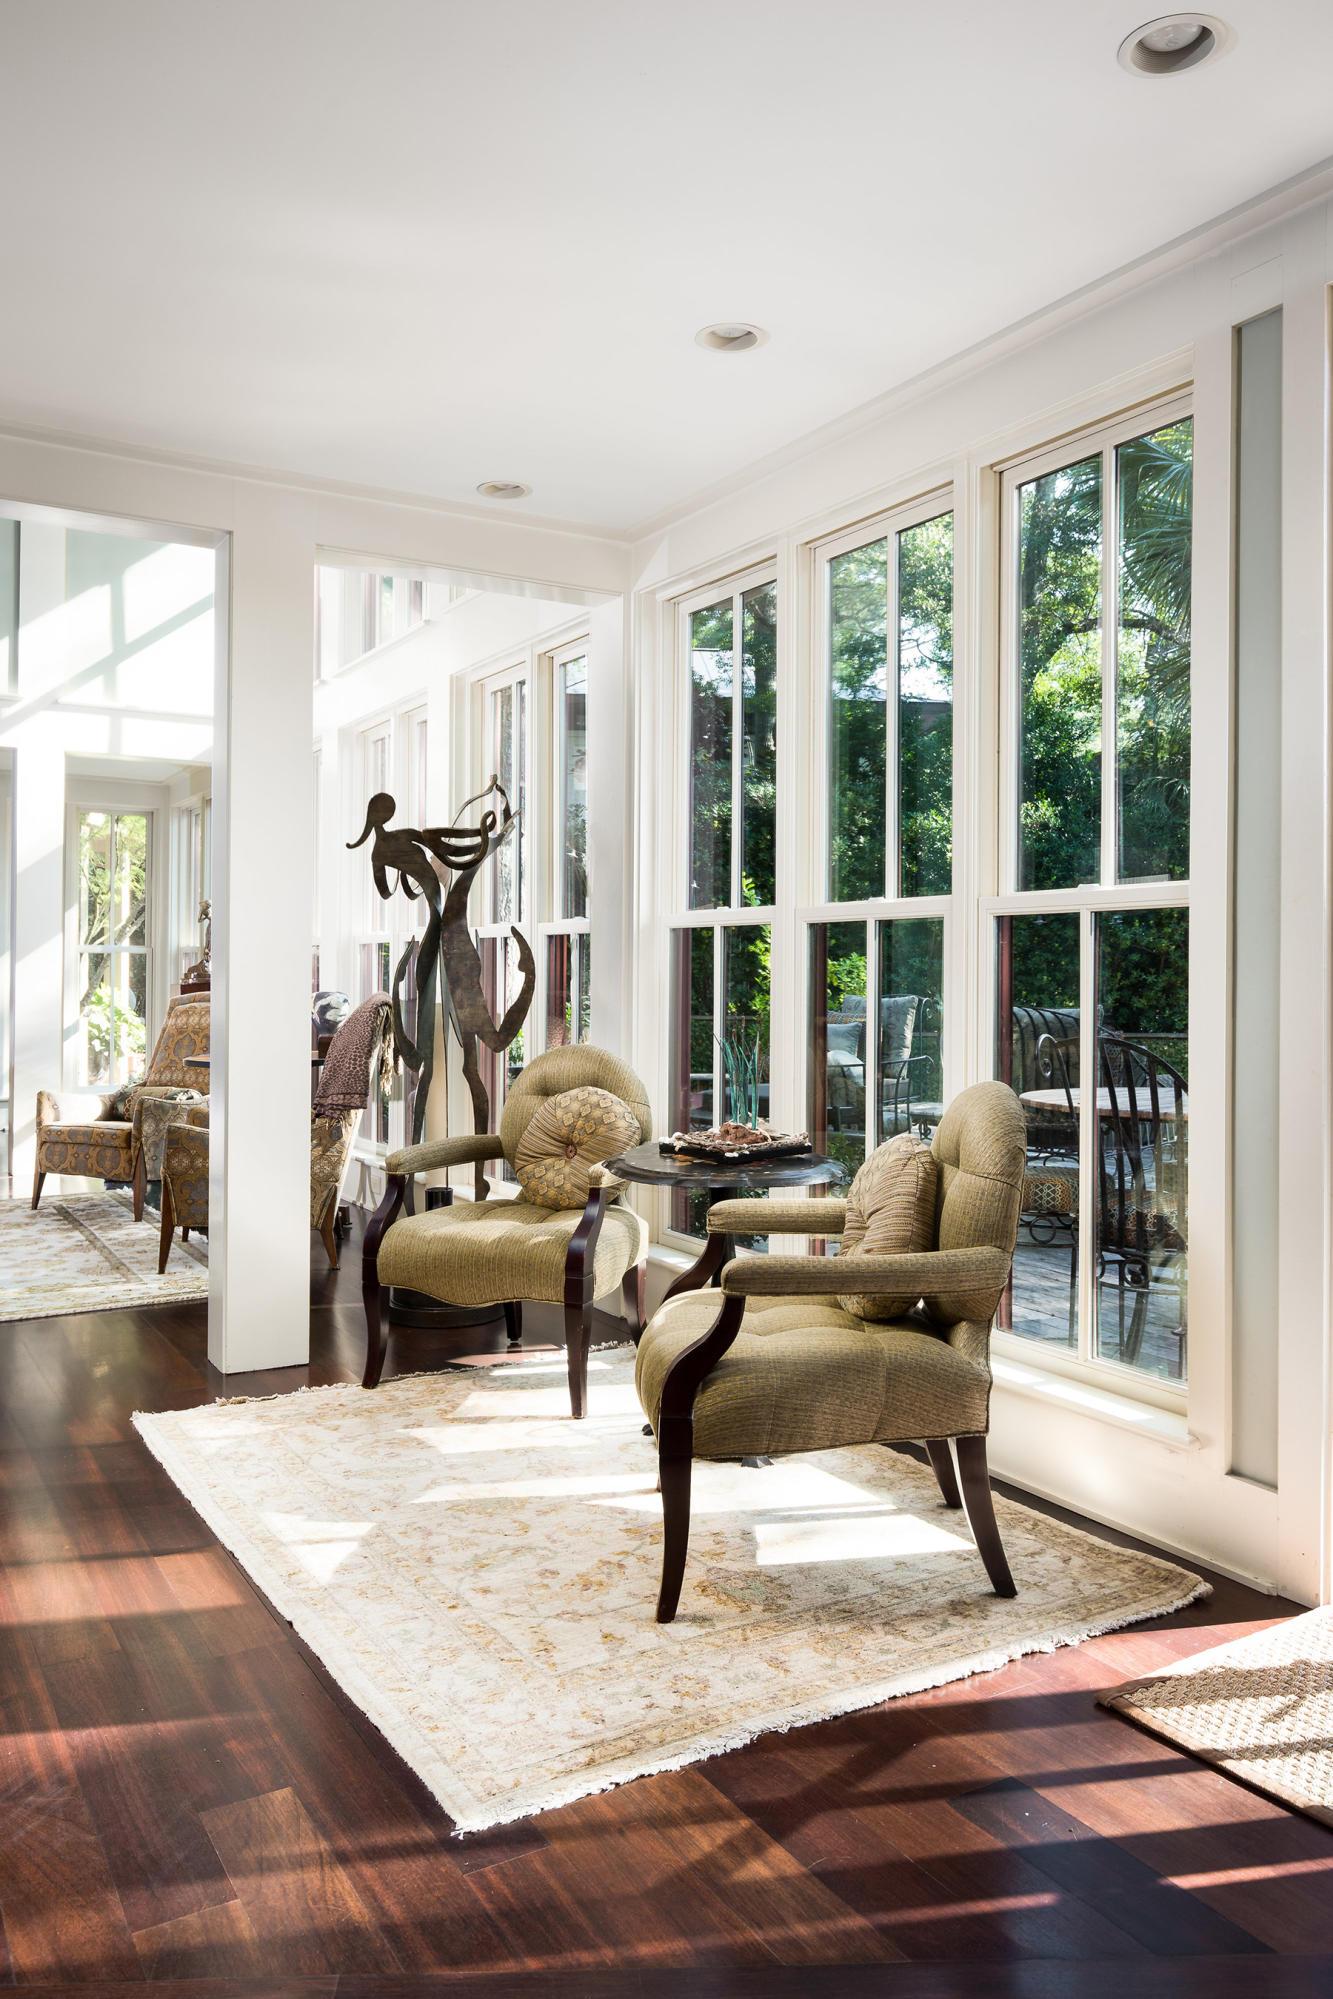 Ellis Oaks Homes For Sale - 672 Ellis Oak, Charleston, SC - 18